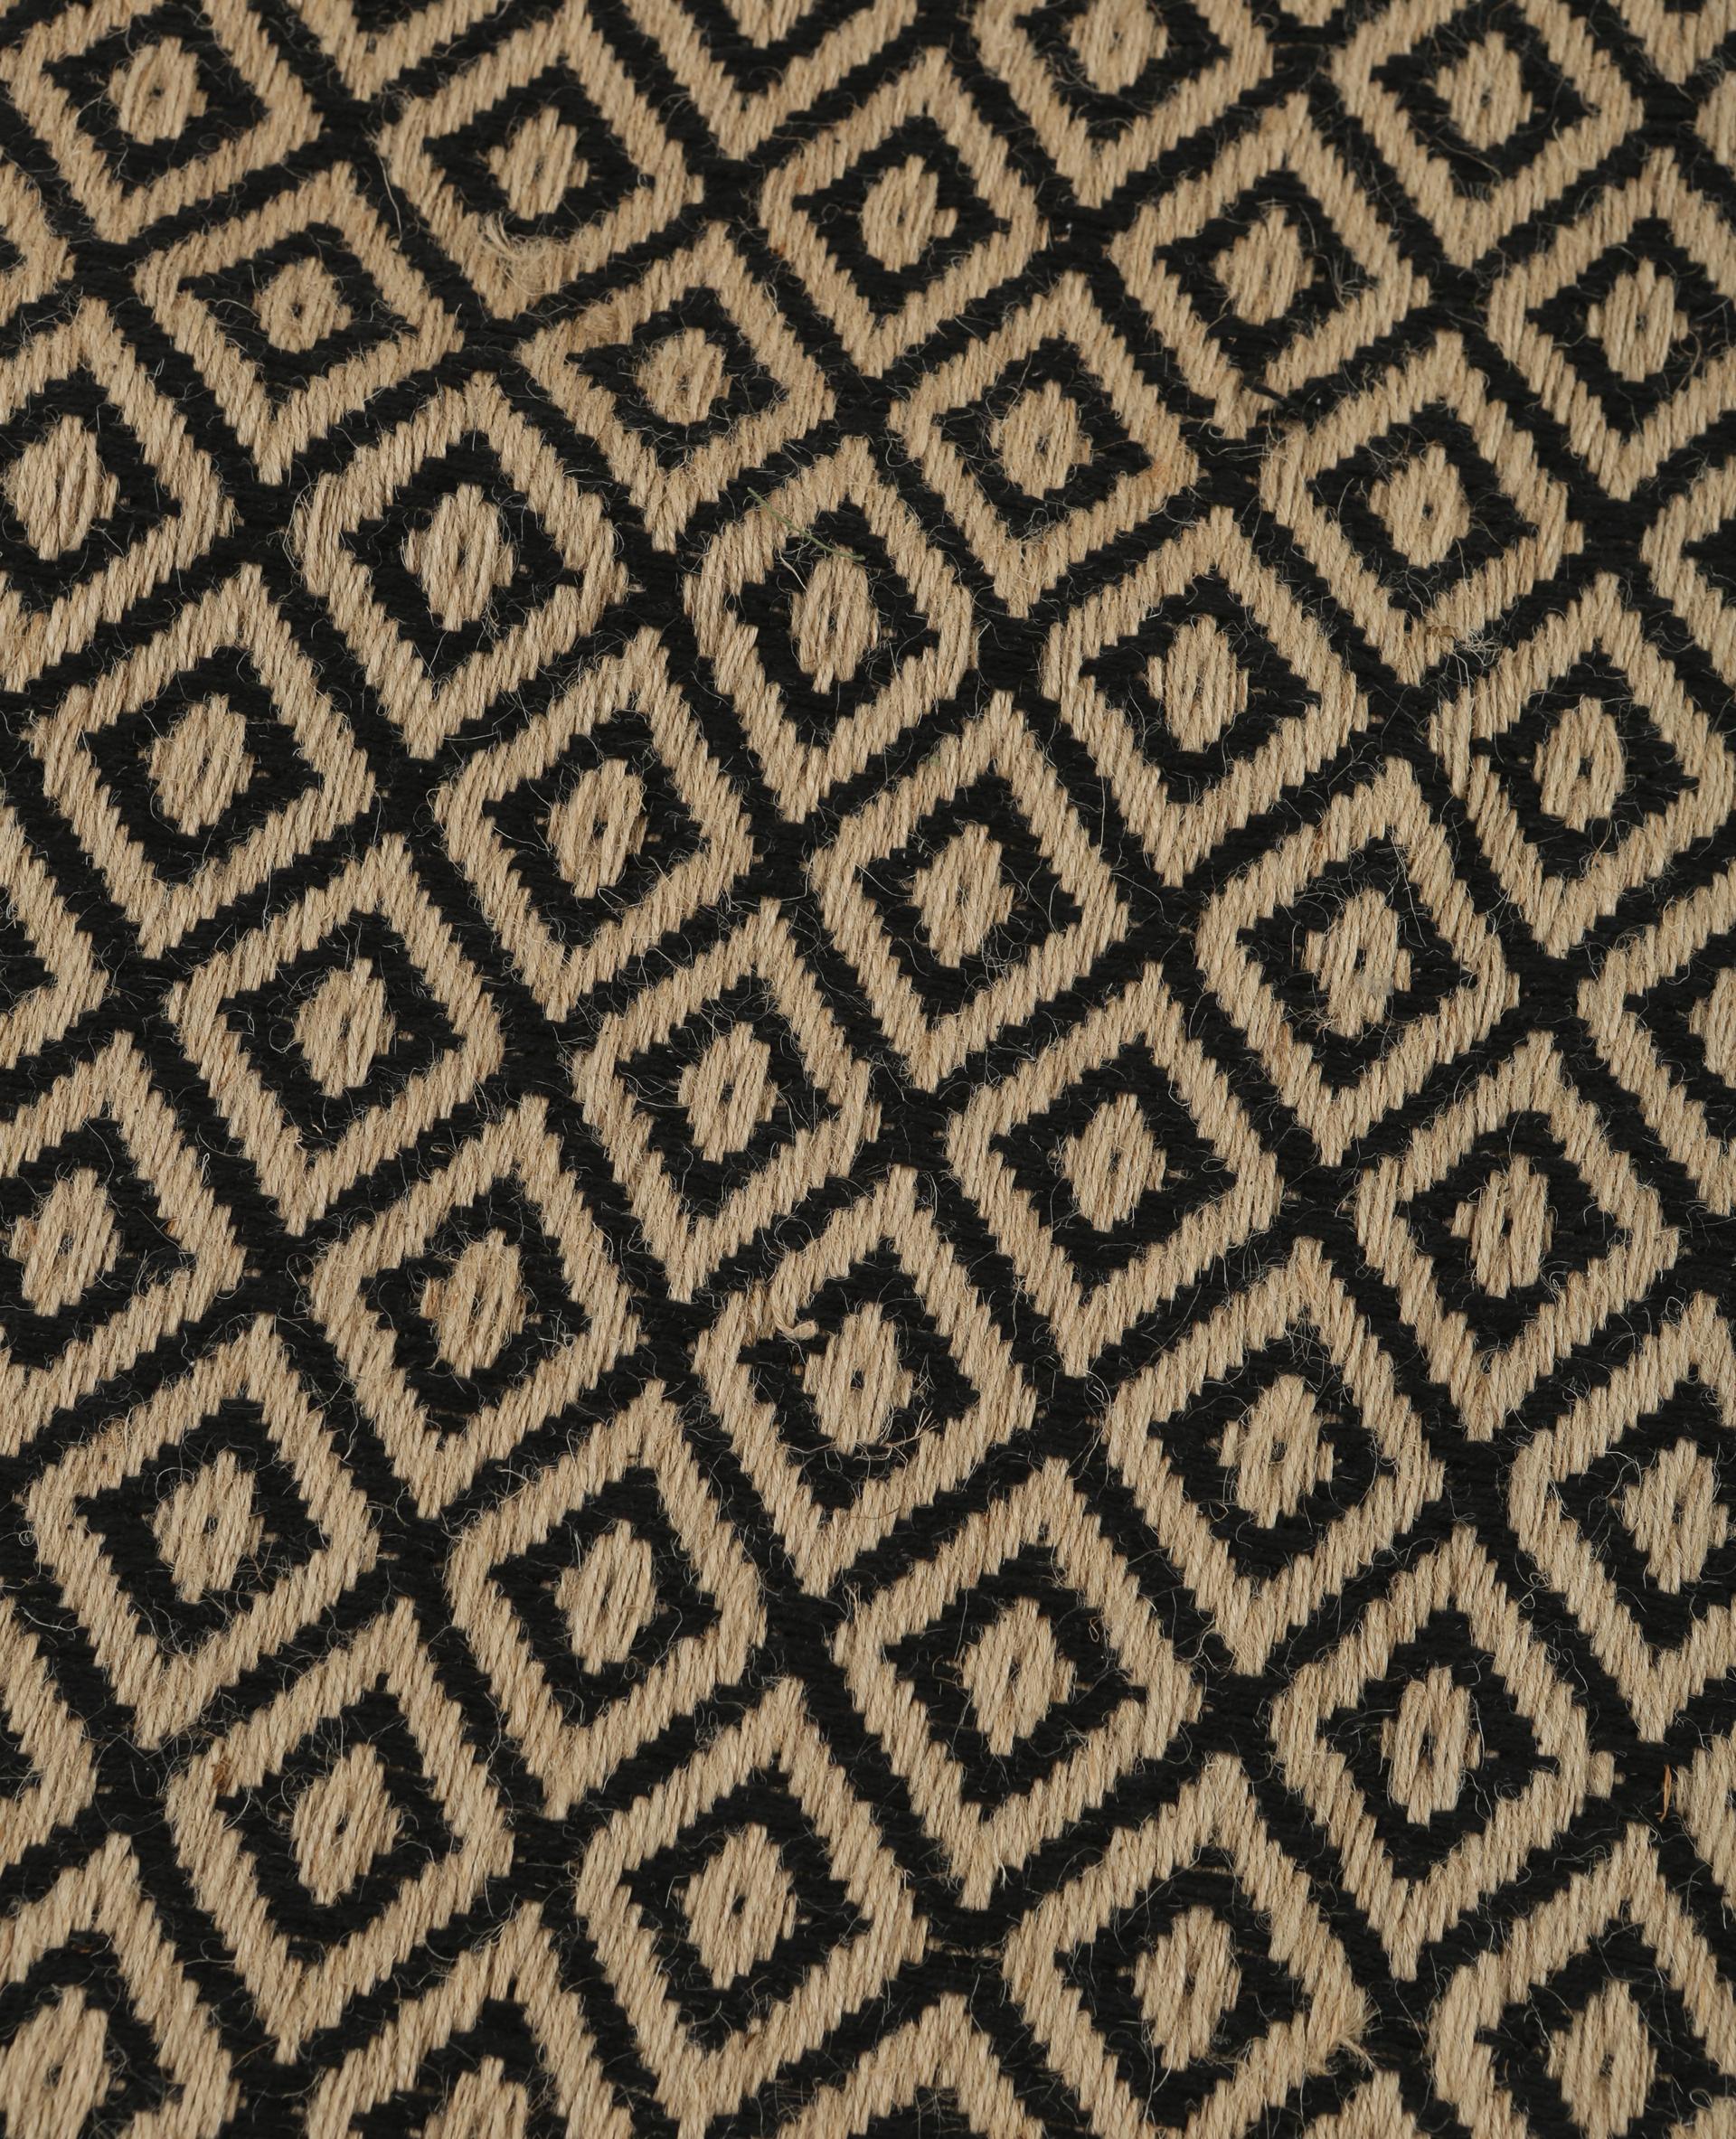 tapis en jute noir 902886899c07 pimkie. Black Bedroom Furniture Sets. Home Design Ideas